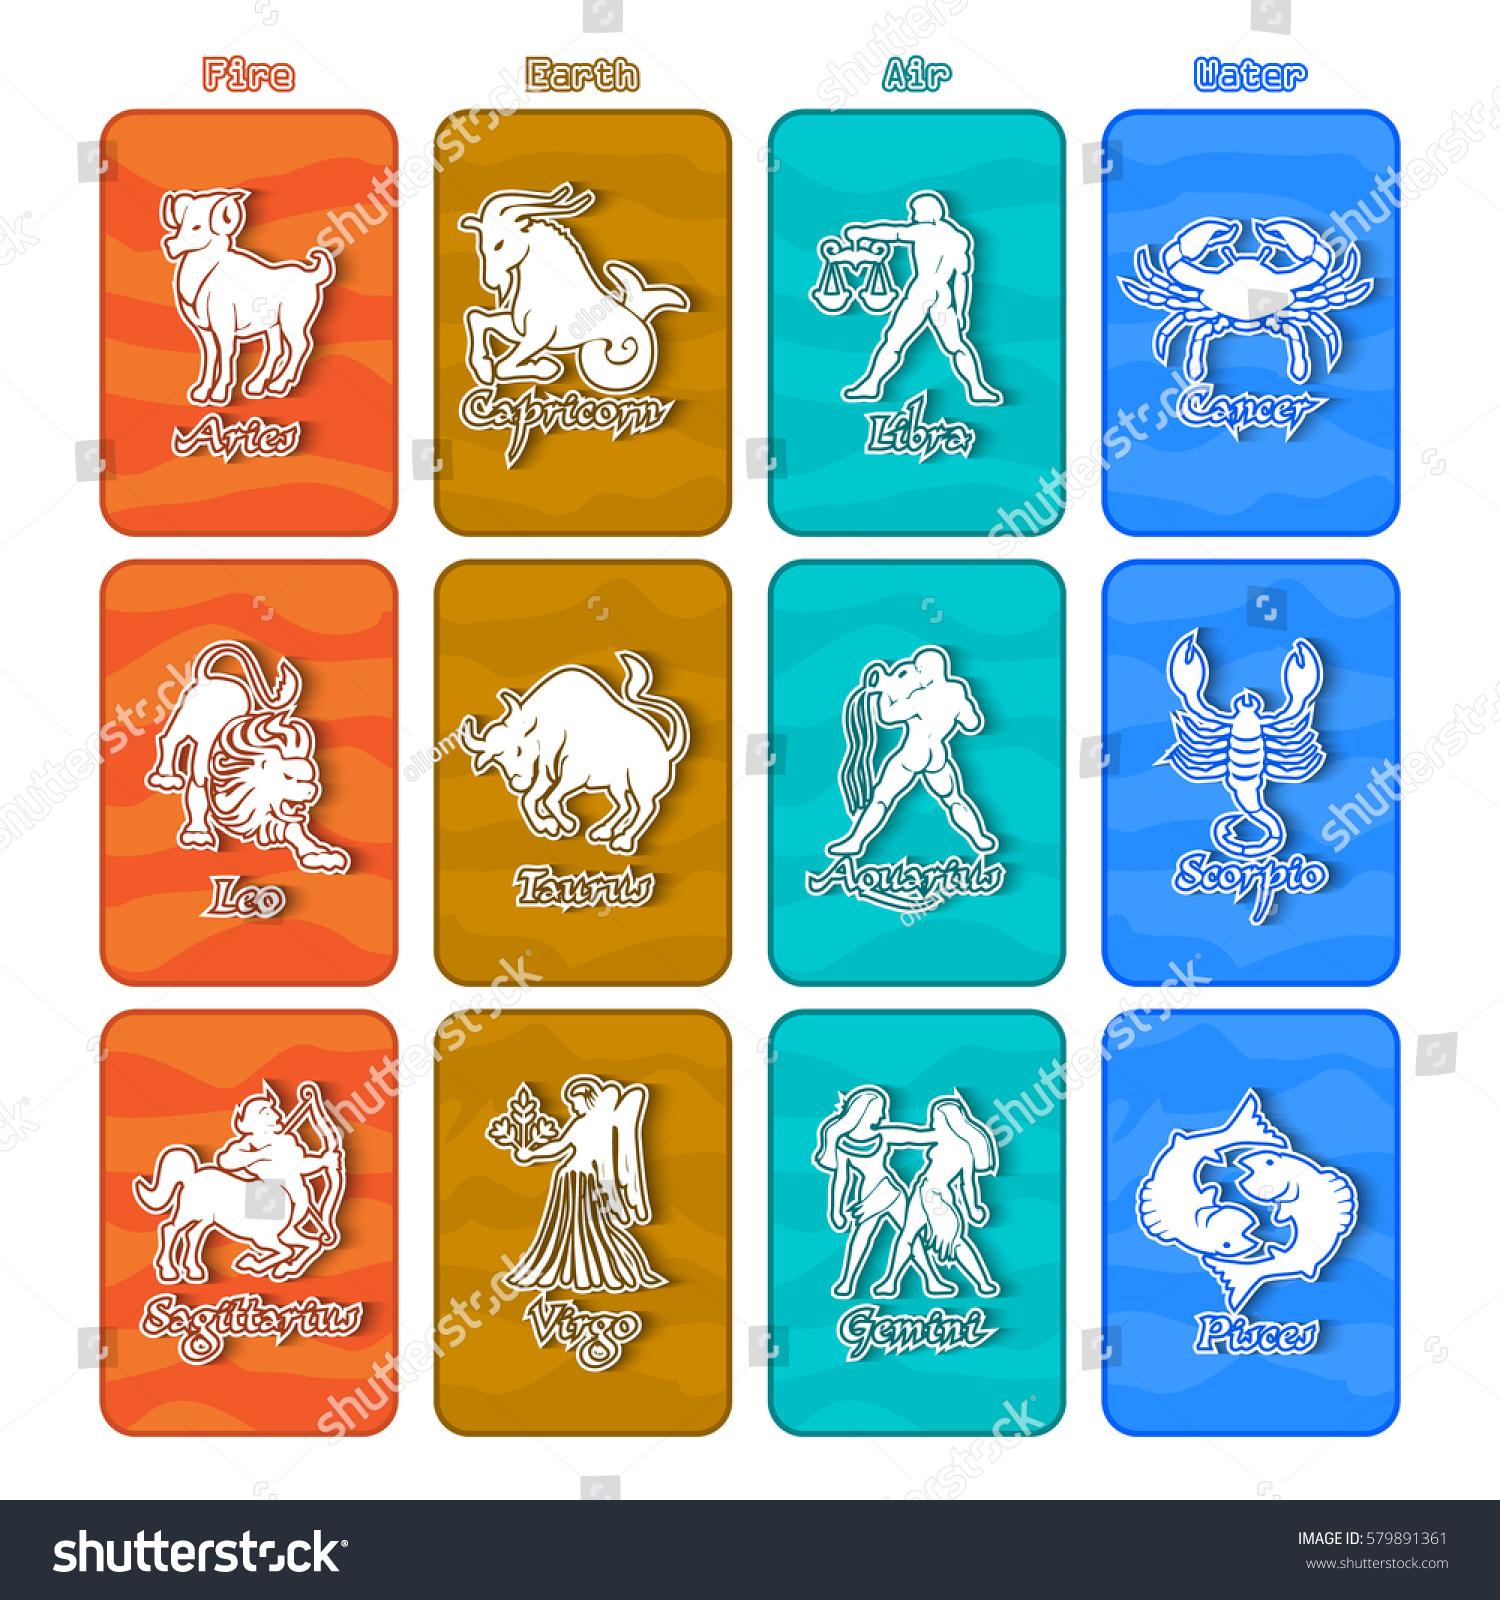 virgo and aries horoscope